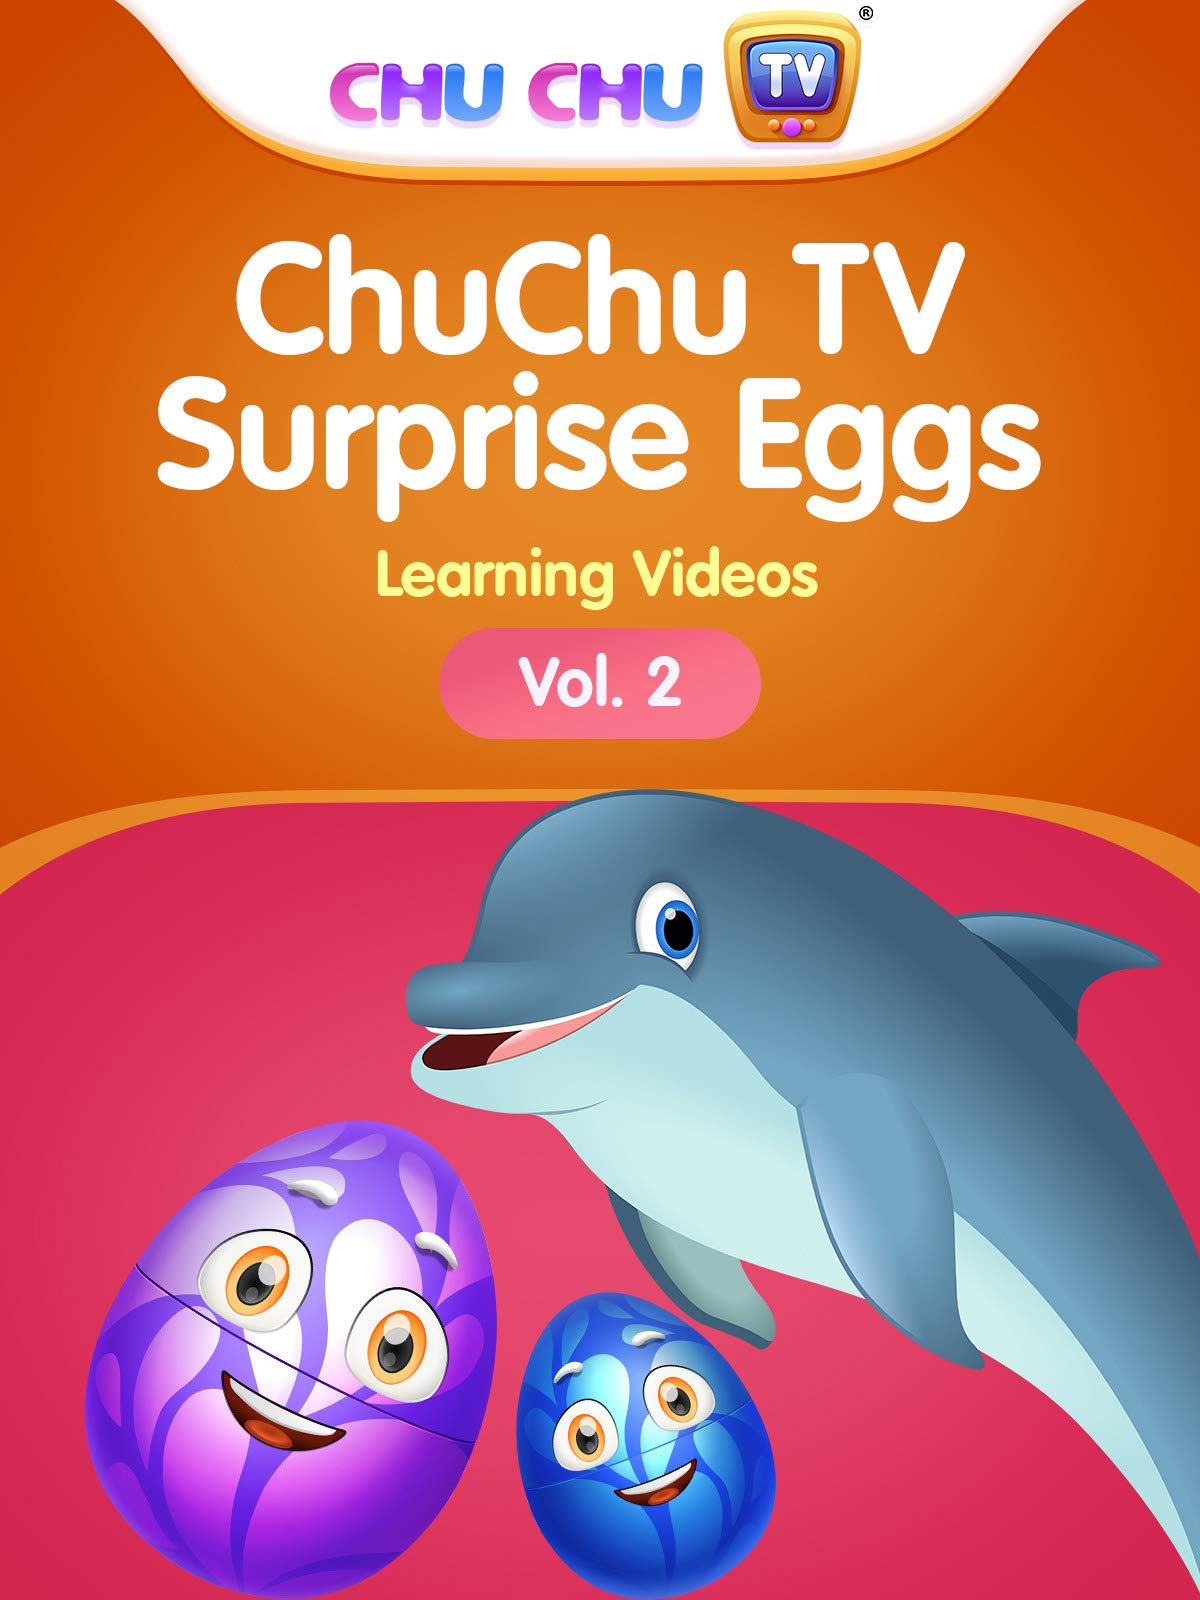 ChuChu TV Surprise Eggs Learning Videos - Vol. 2